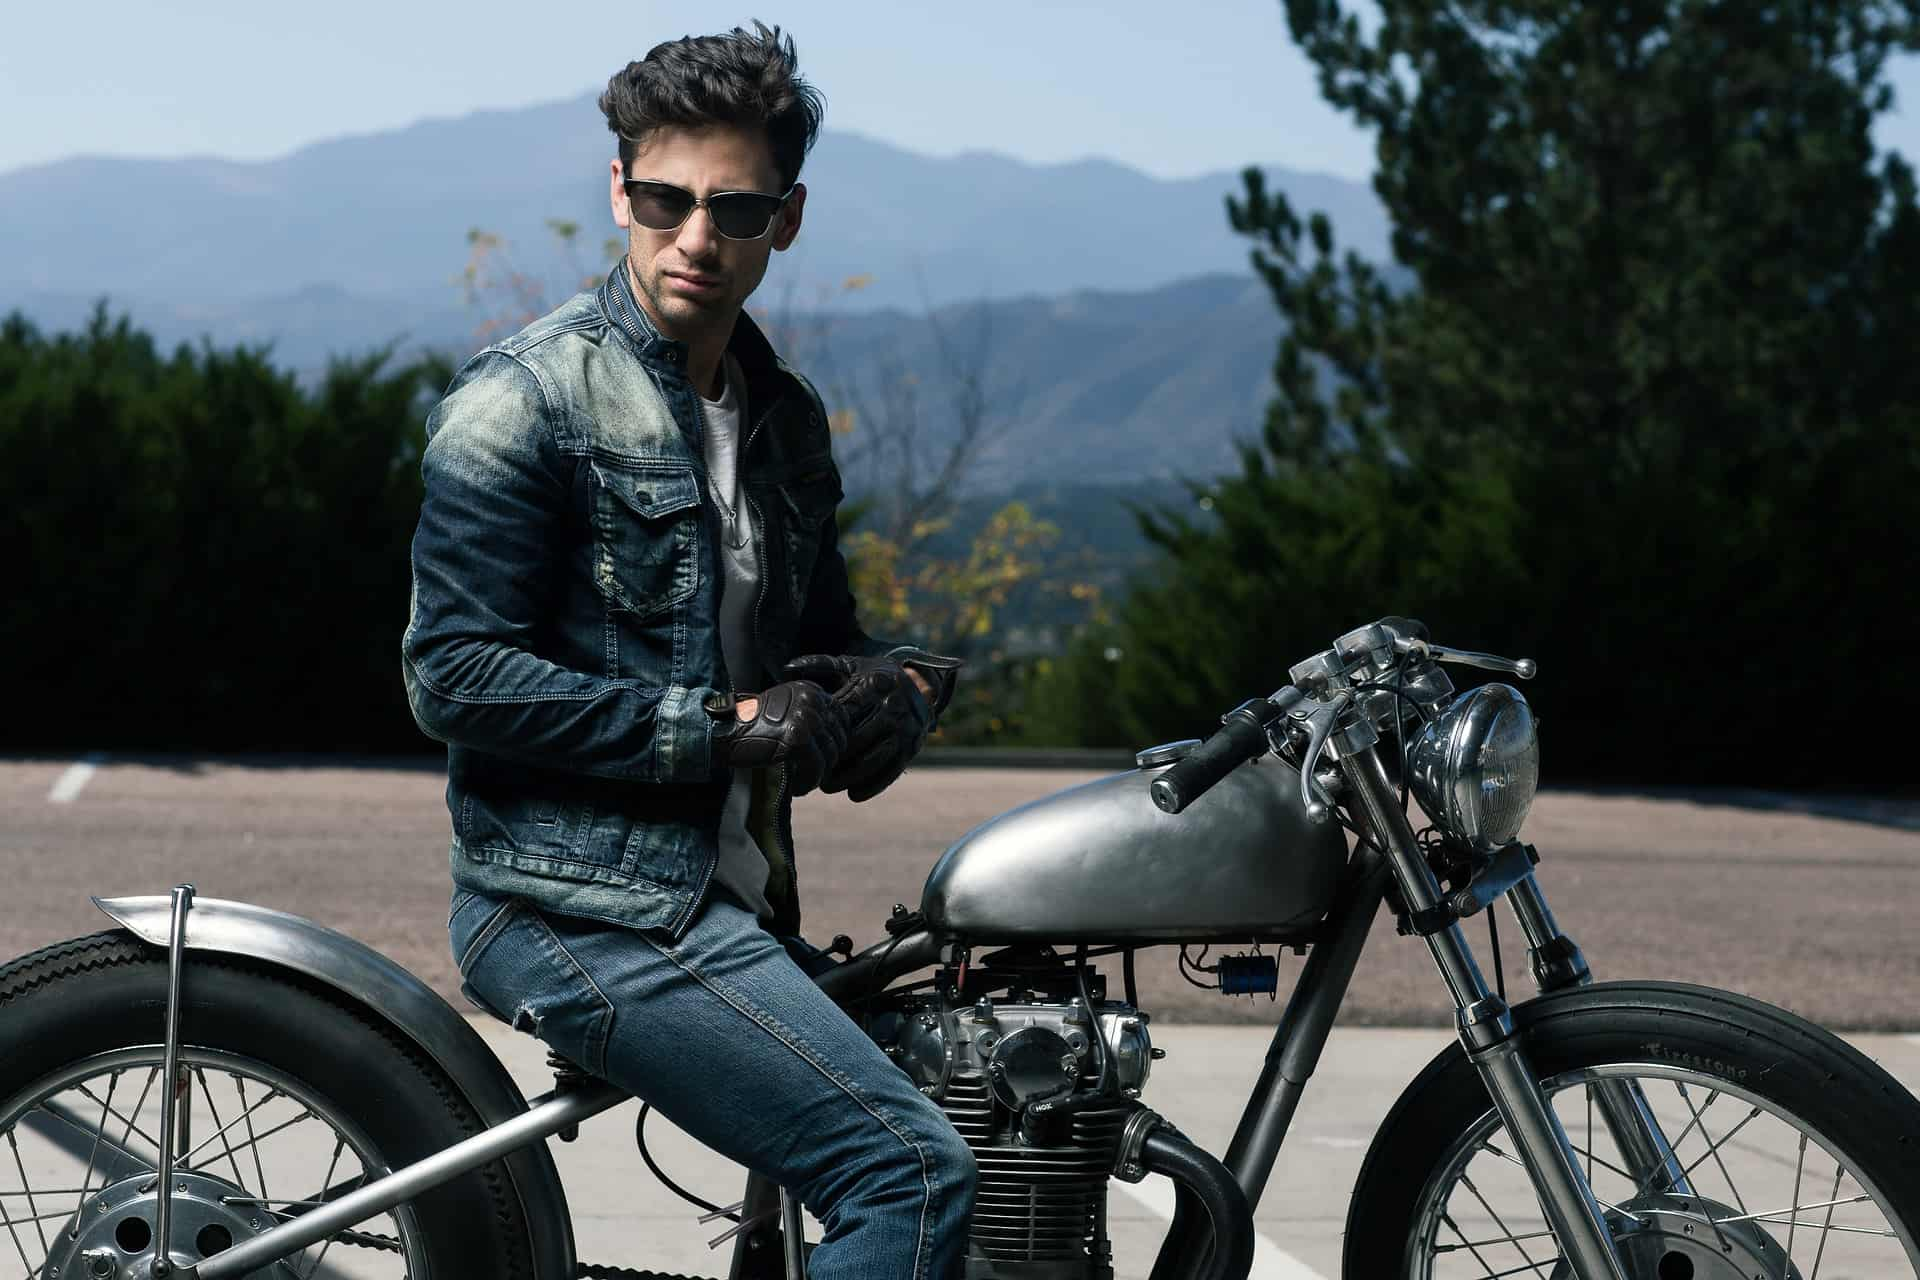 man jacket motorcycle gloves